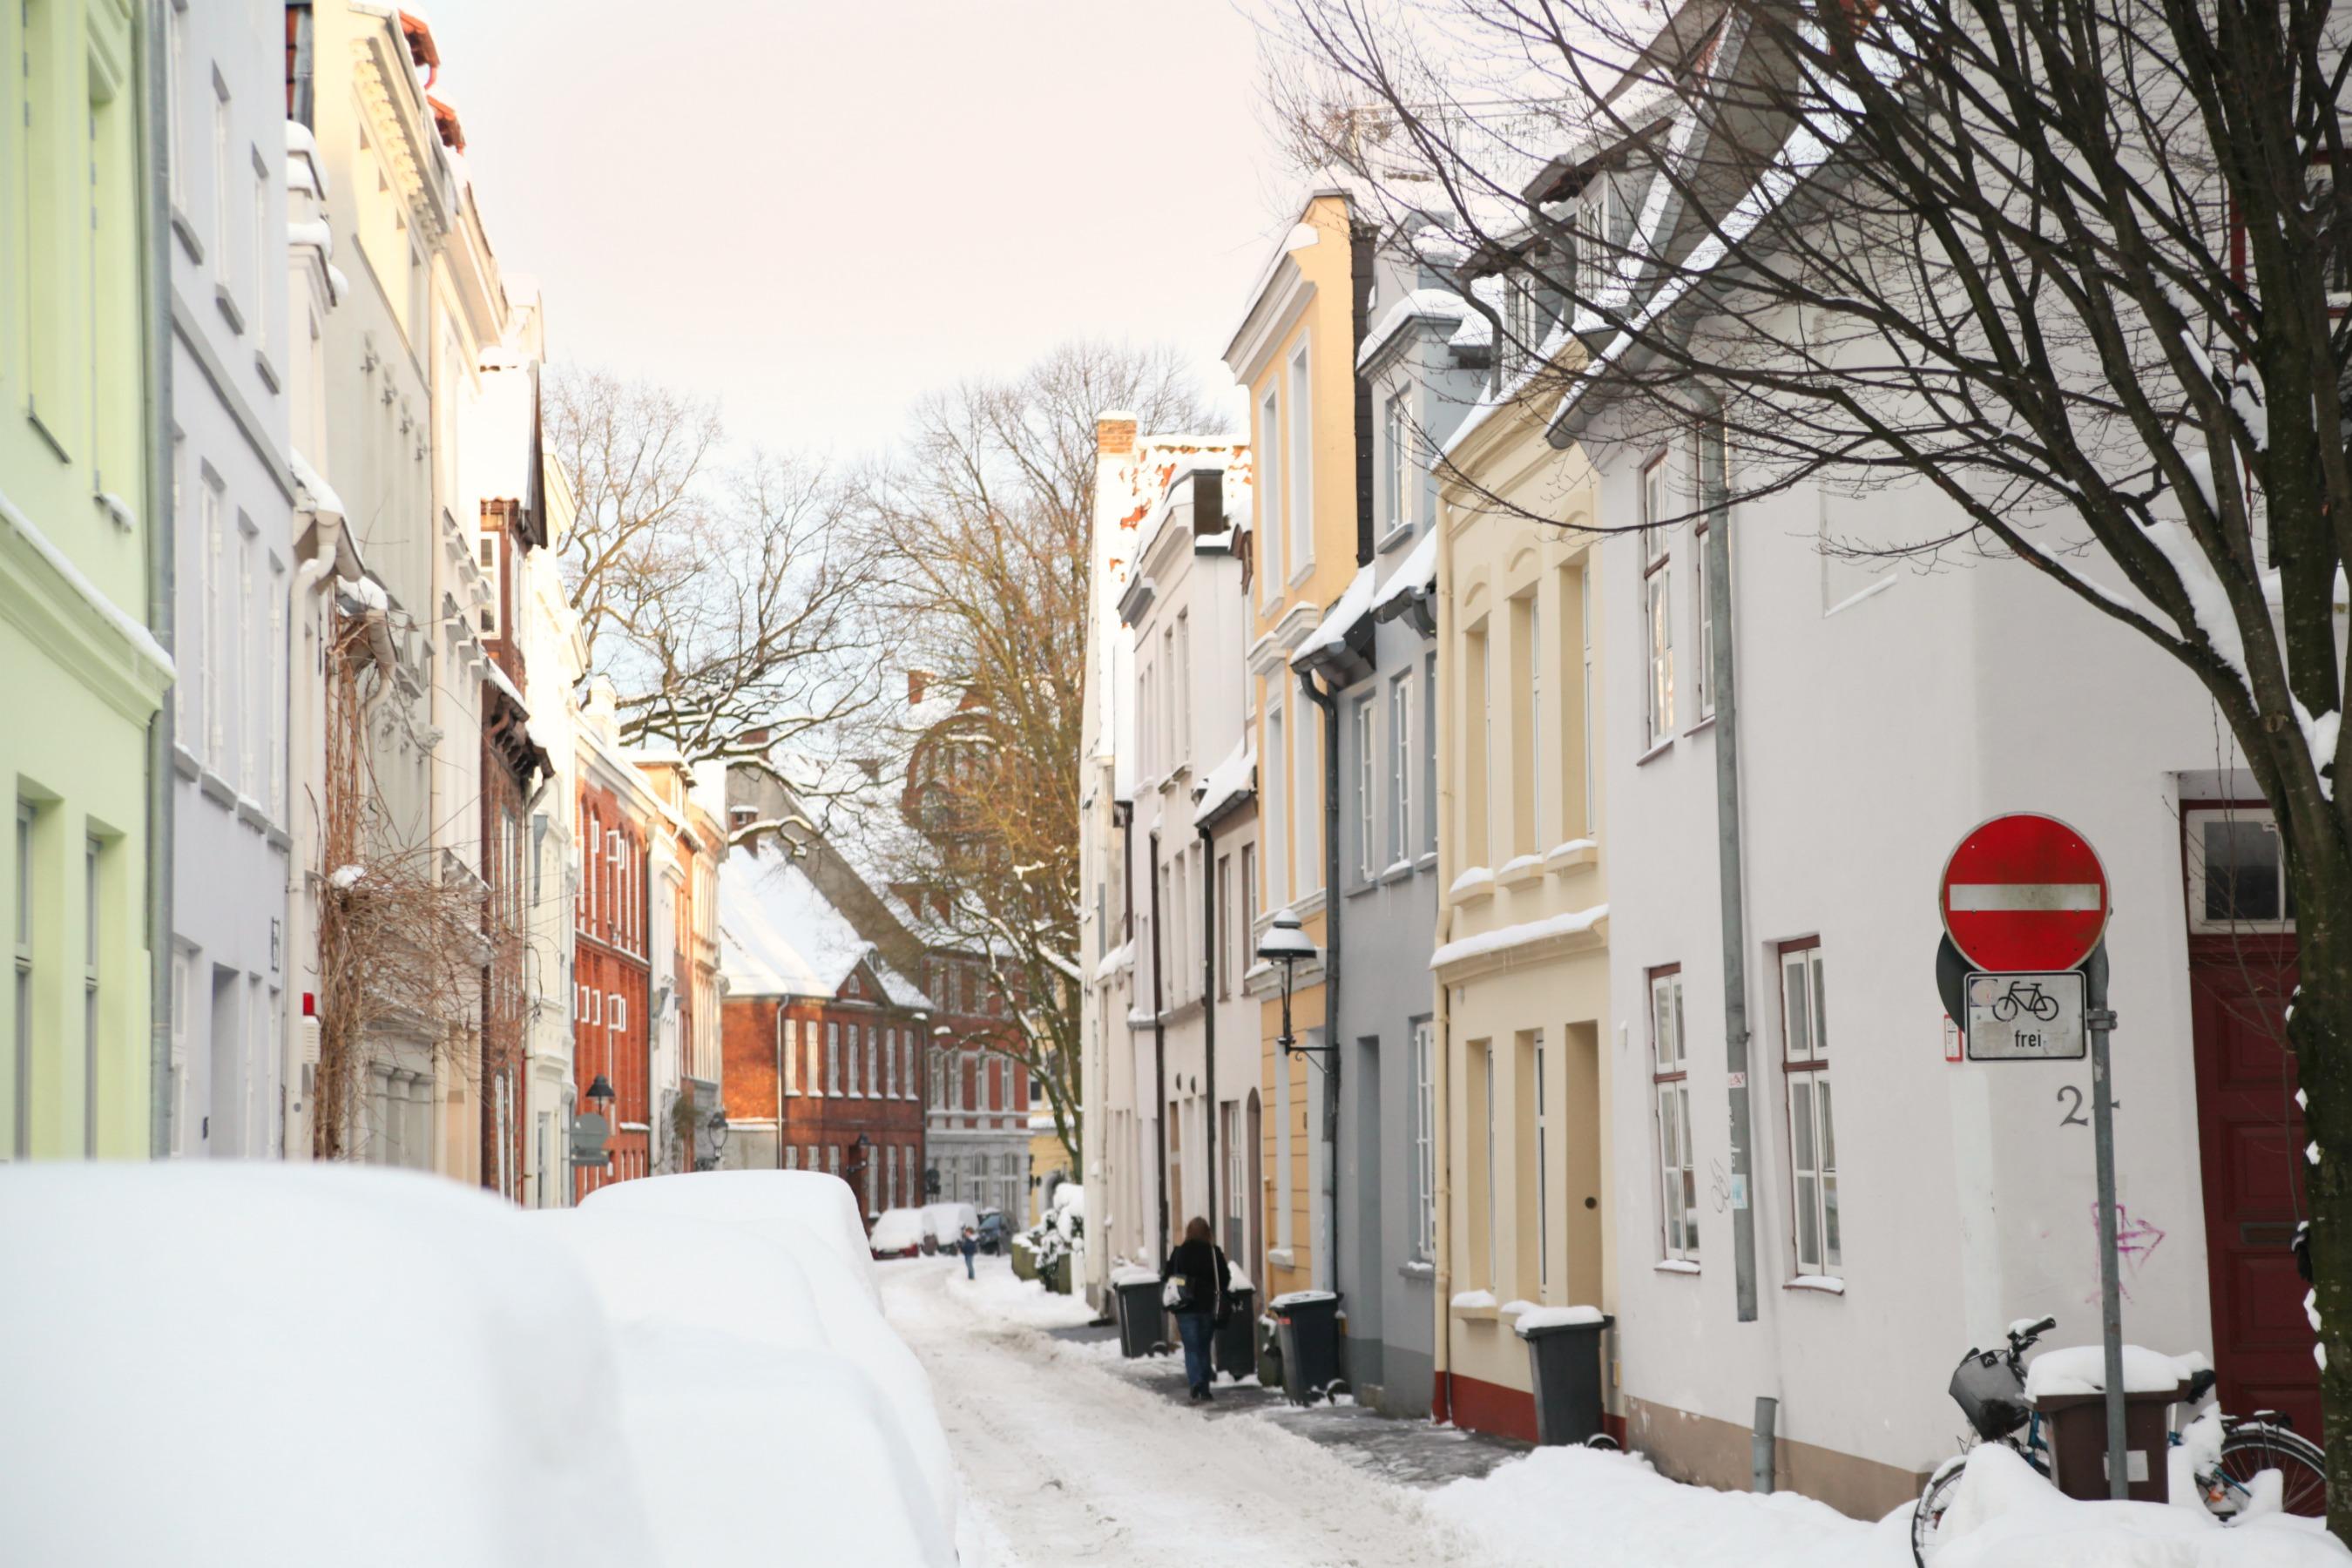 Streets of Lübeck